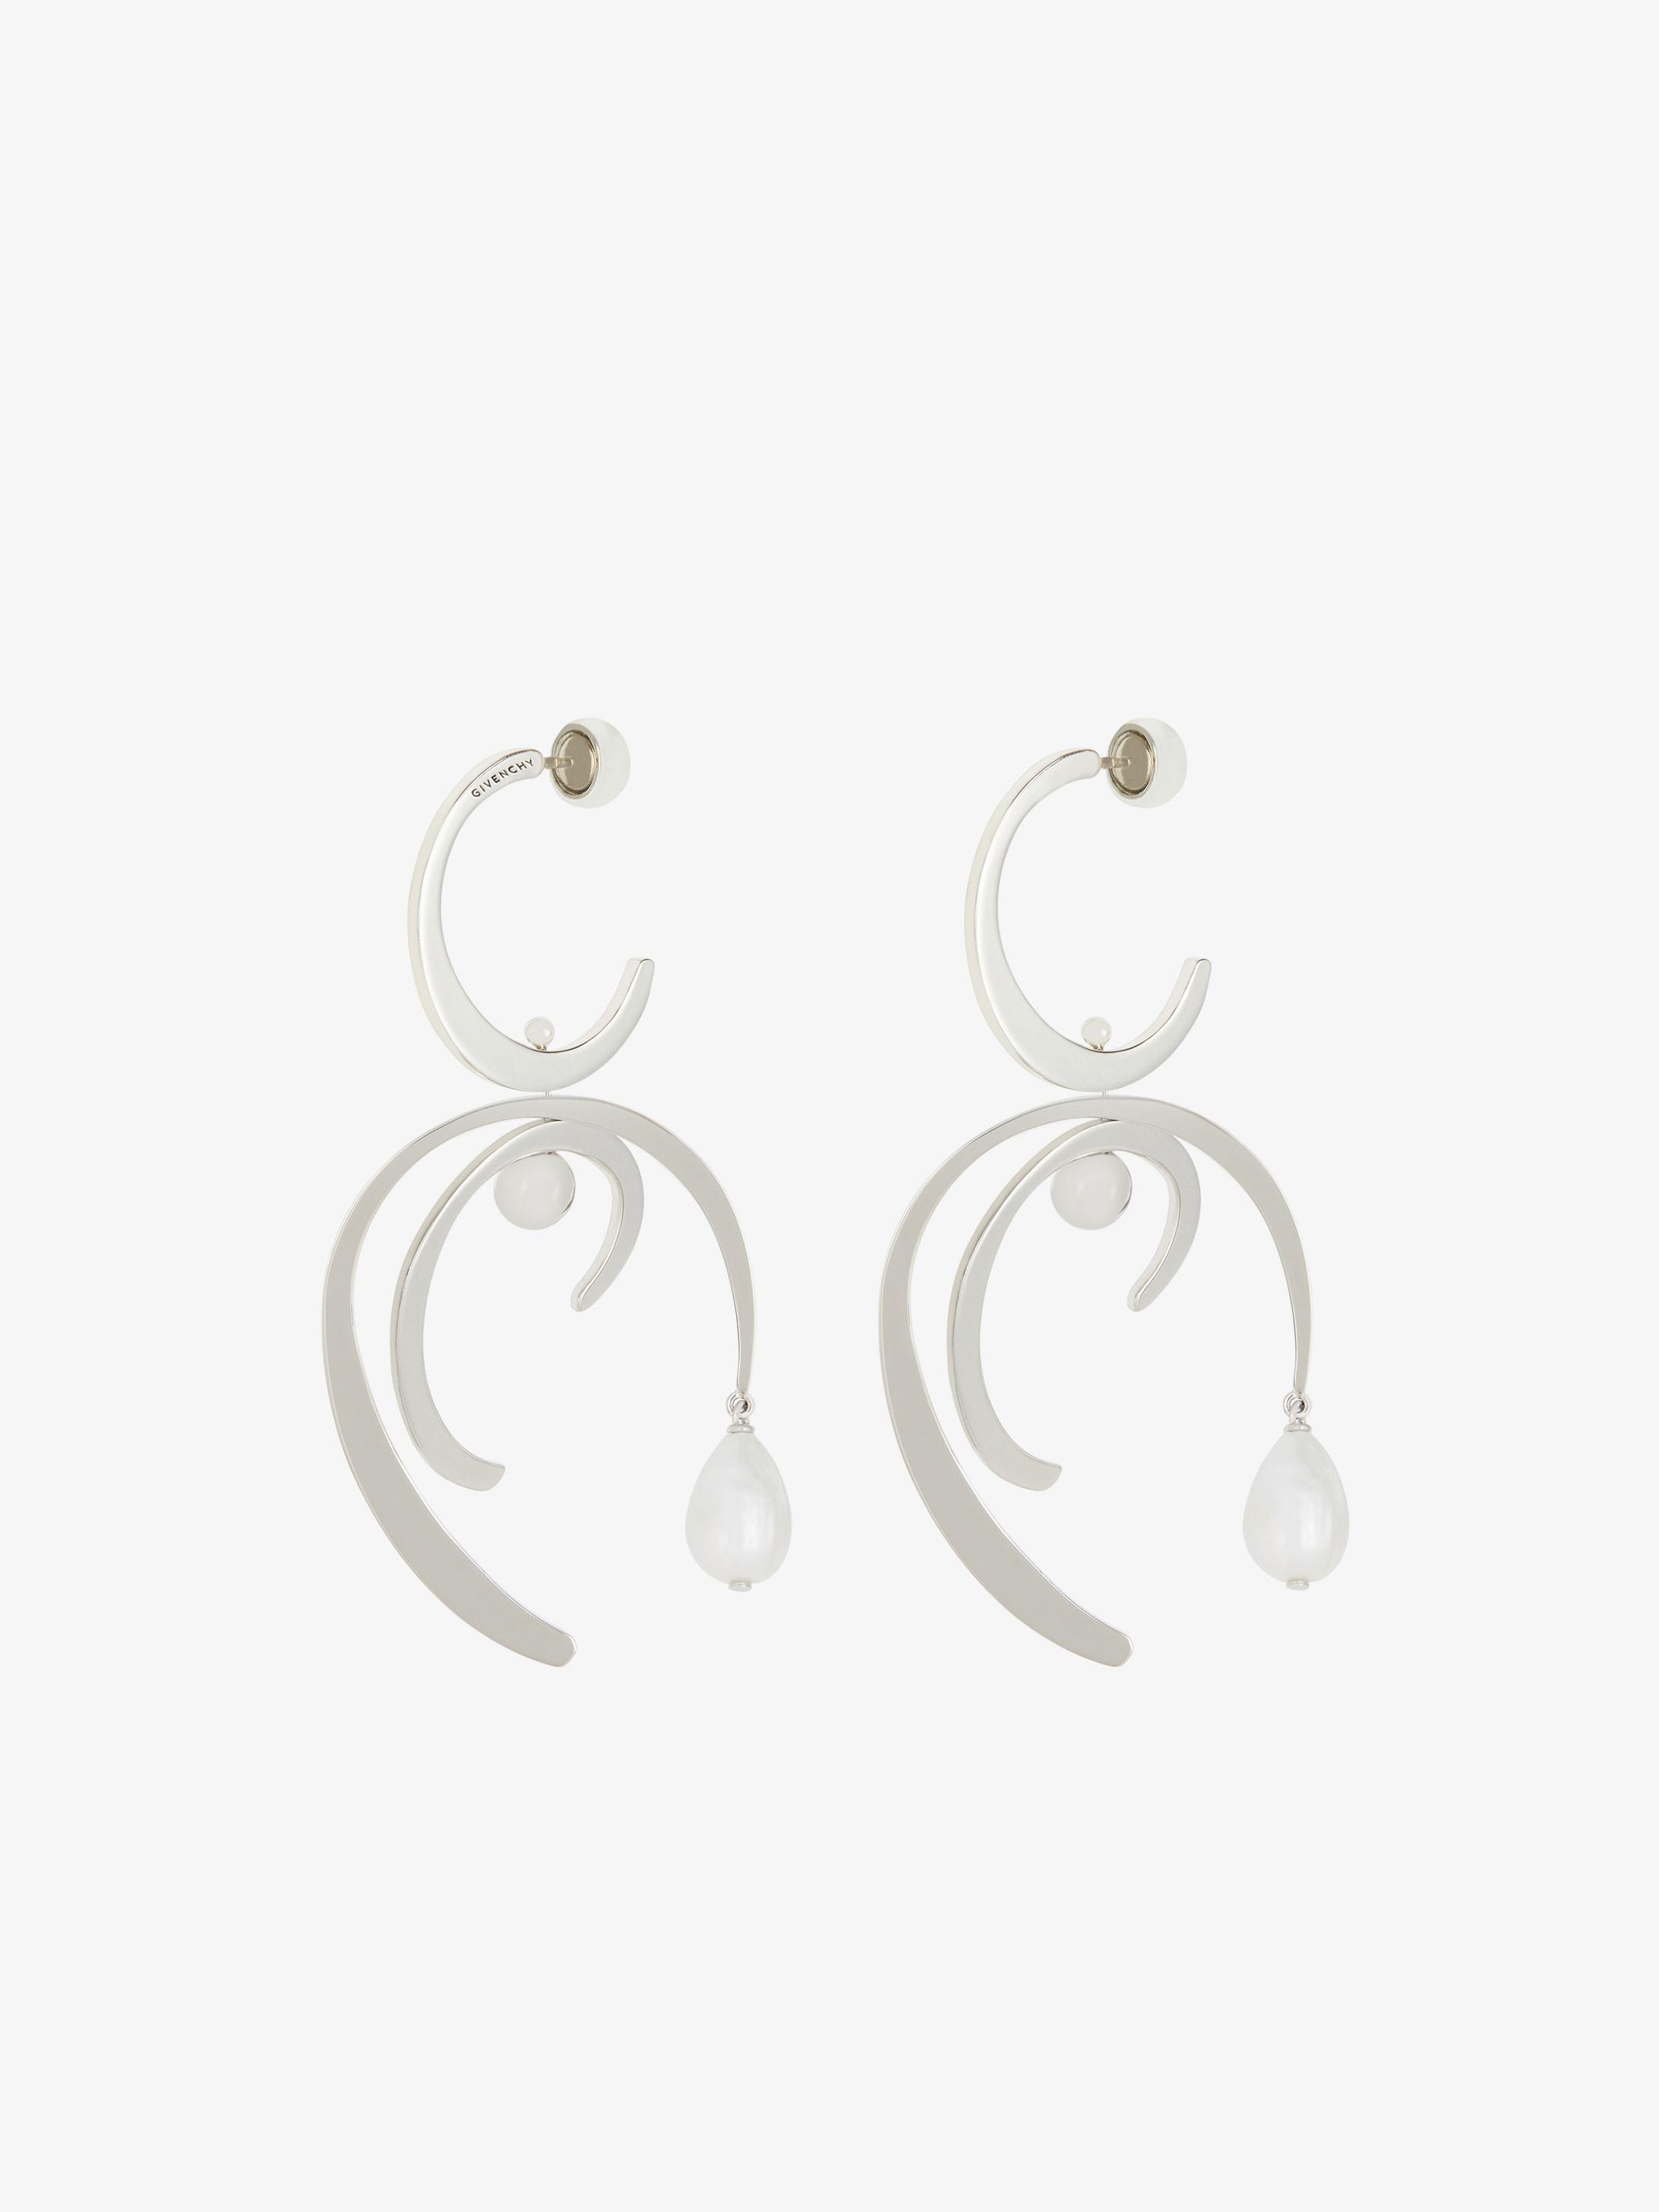 Harp earrings with pearls